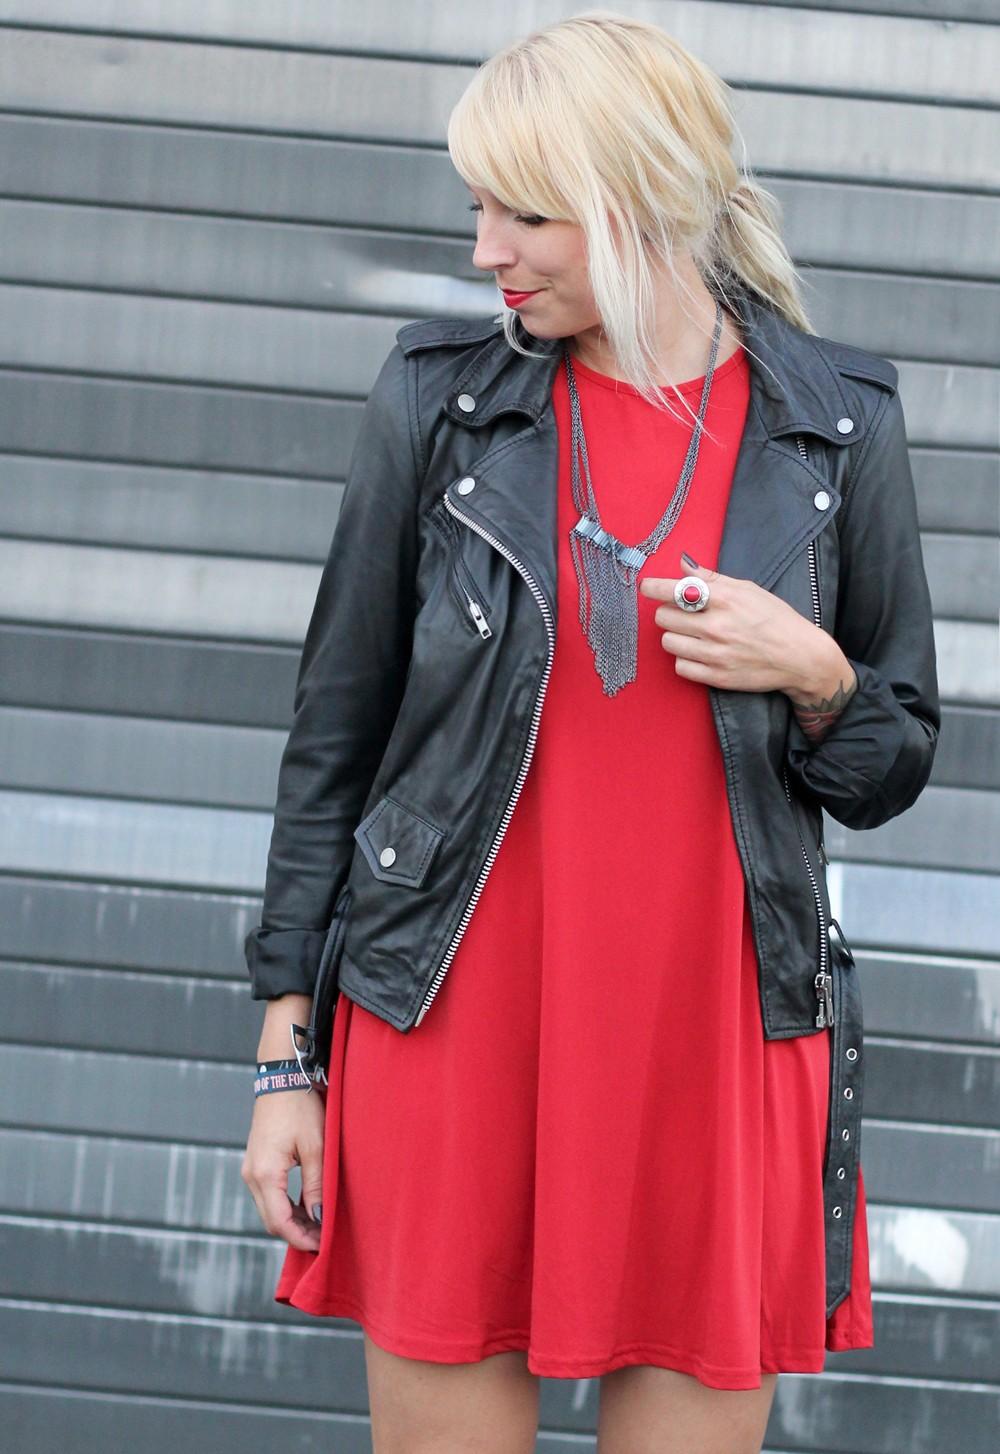 Outfit rotes Kleid Lederjacke Stiefeletten OOTD 12